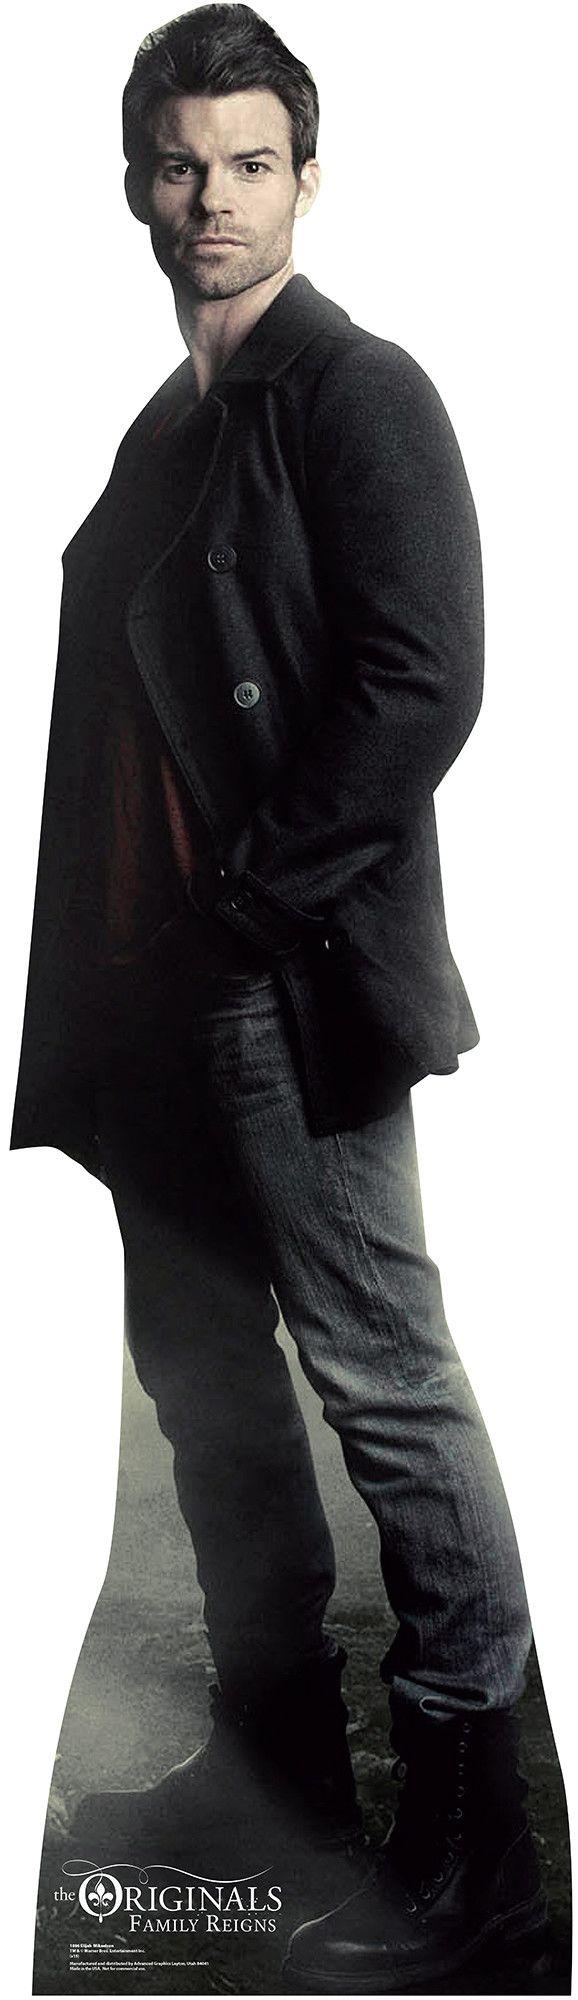 The Originals Elijah Mikaelson Cardboard Standup